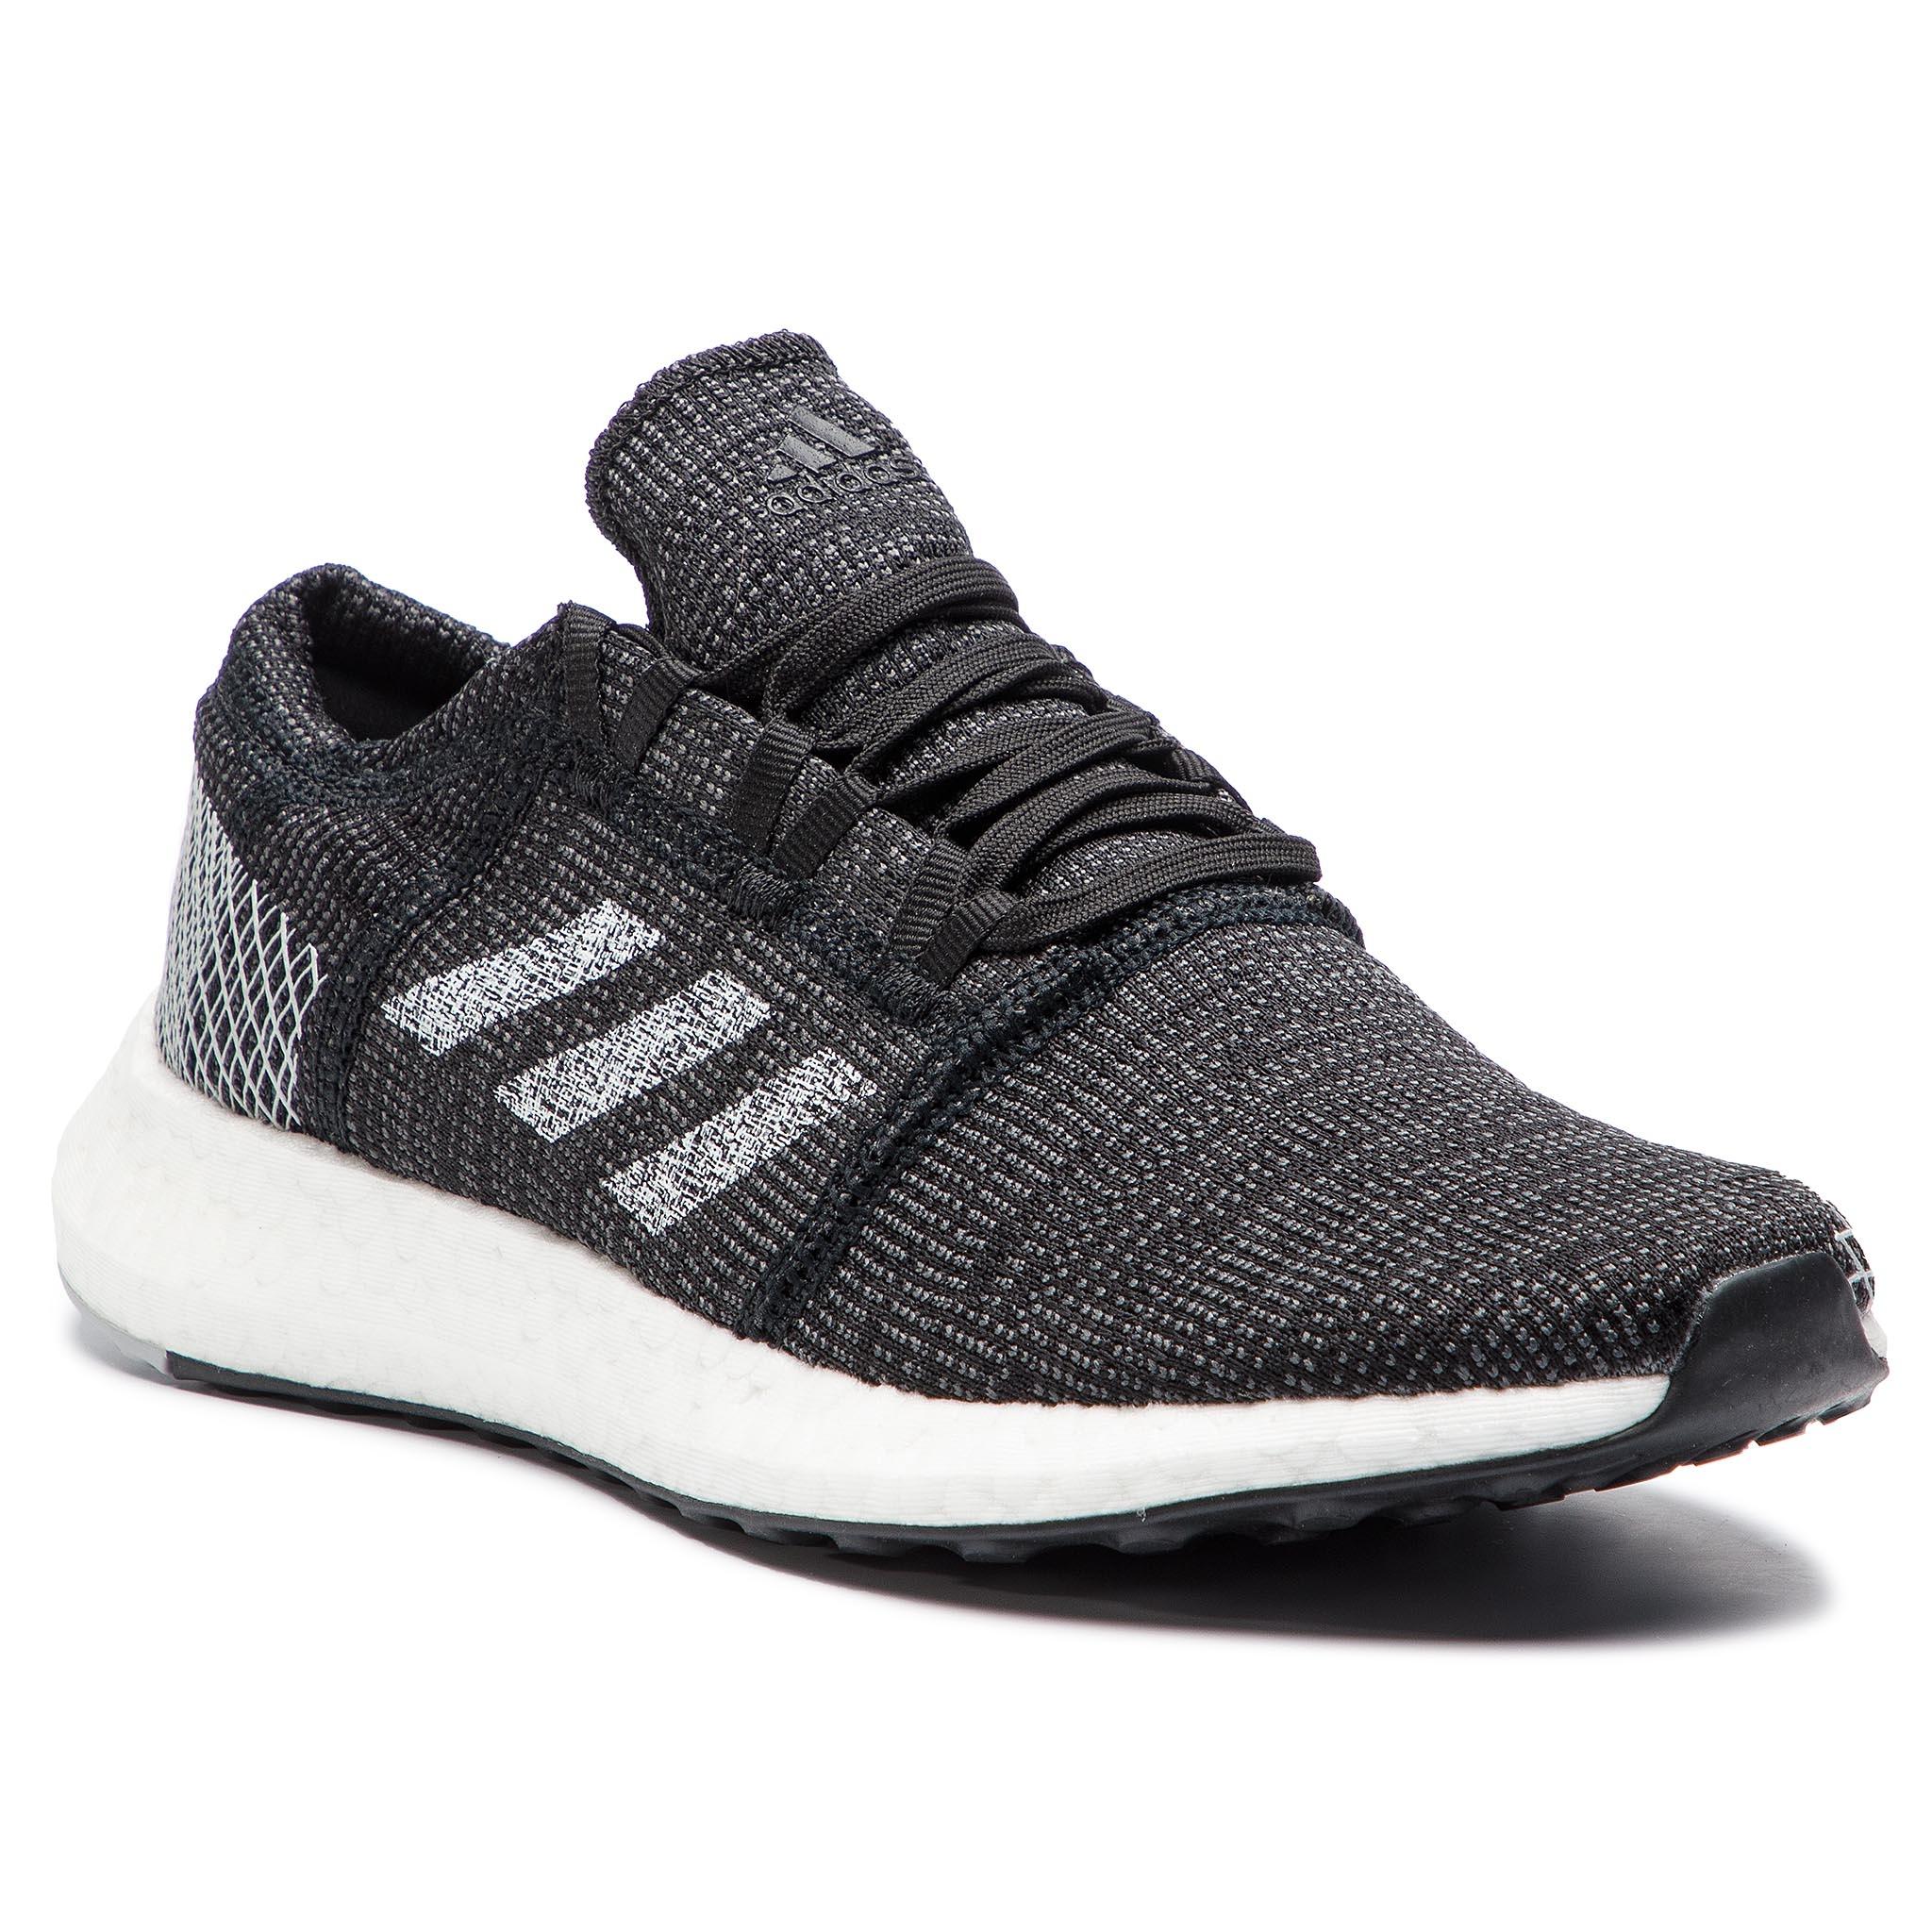 Schuhe adidas PureBoost Go B37805 CbrownCarbonActred